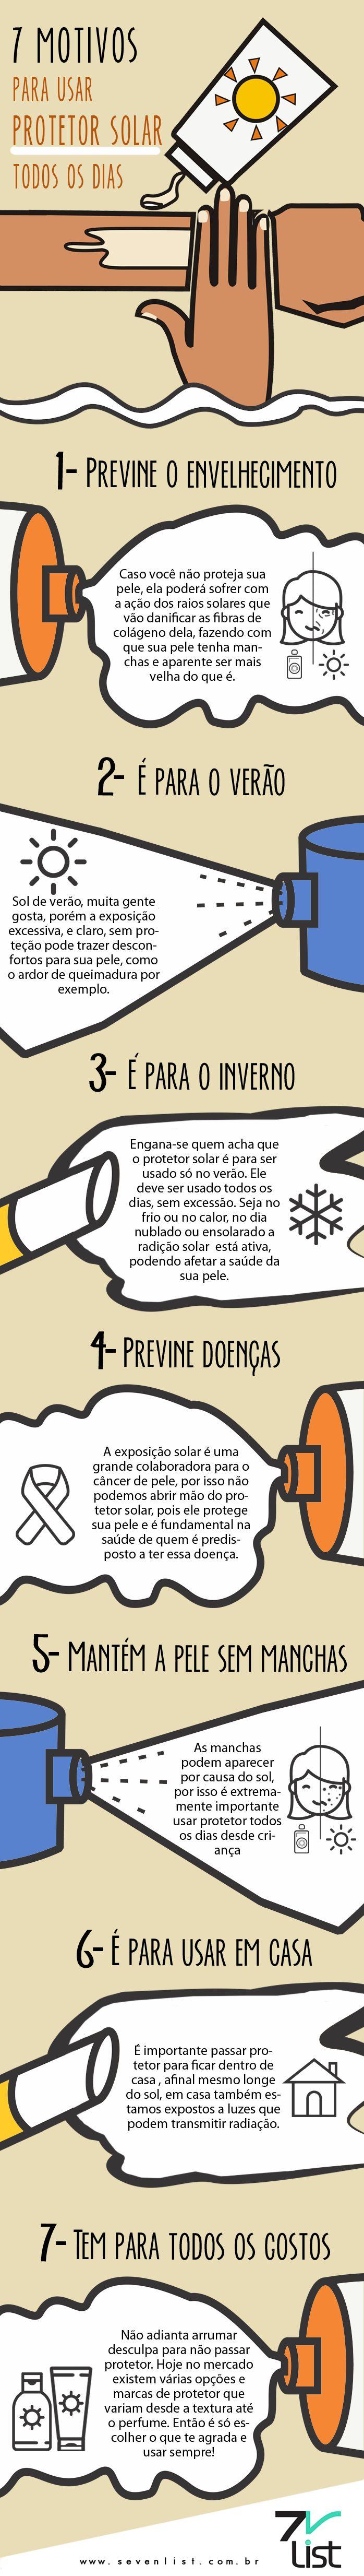 #Infográfico #Infographic #List #Lista #Sevenlist #Pele #Saúde #Bemestar #Sol…                                                                                                                                                                                 Mais